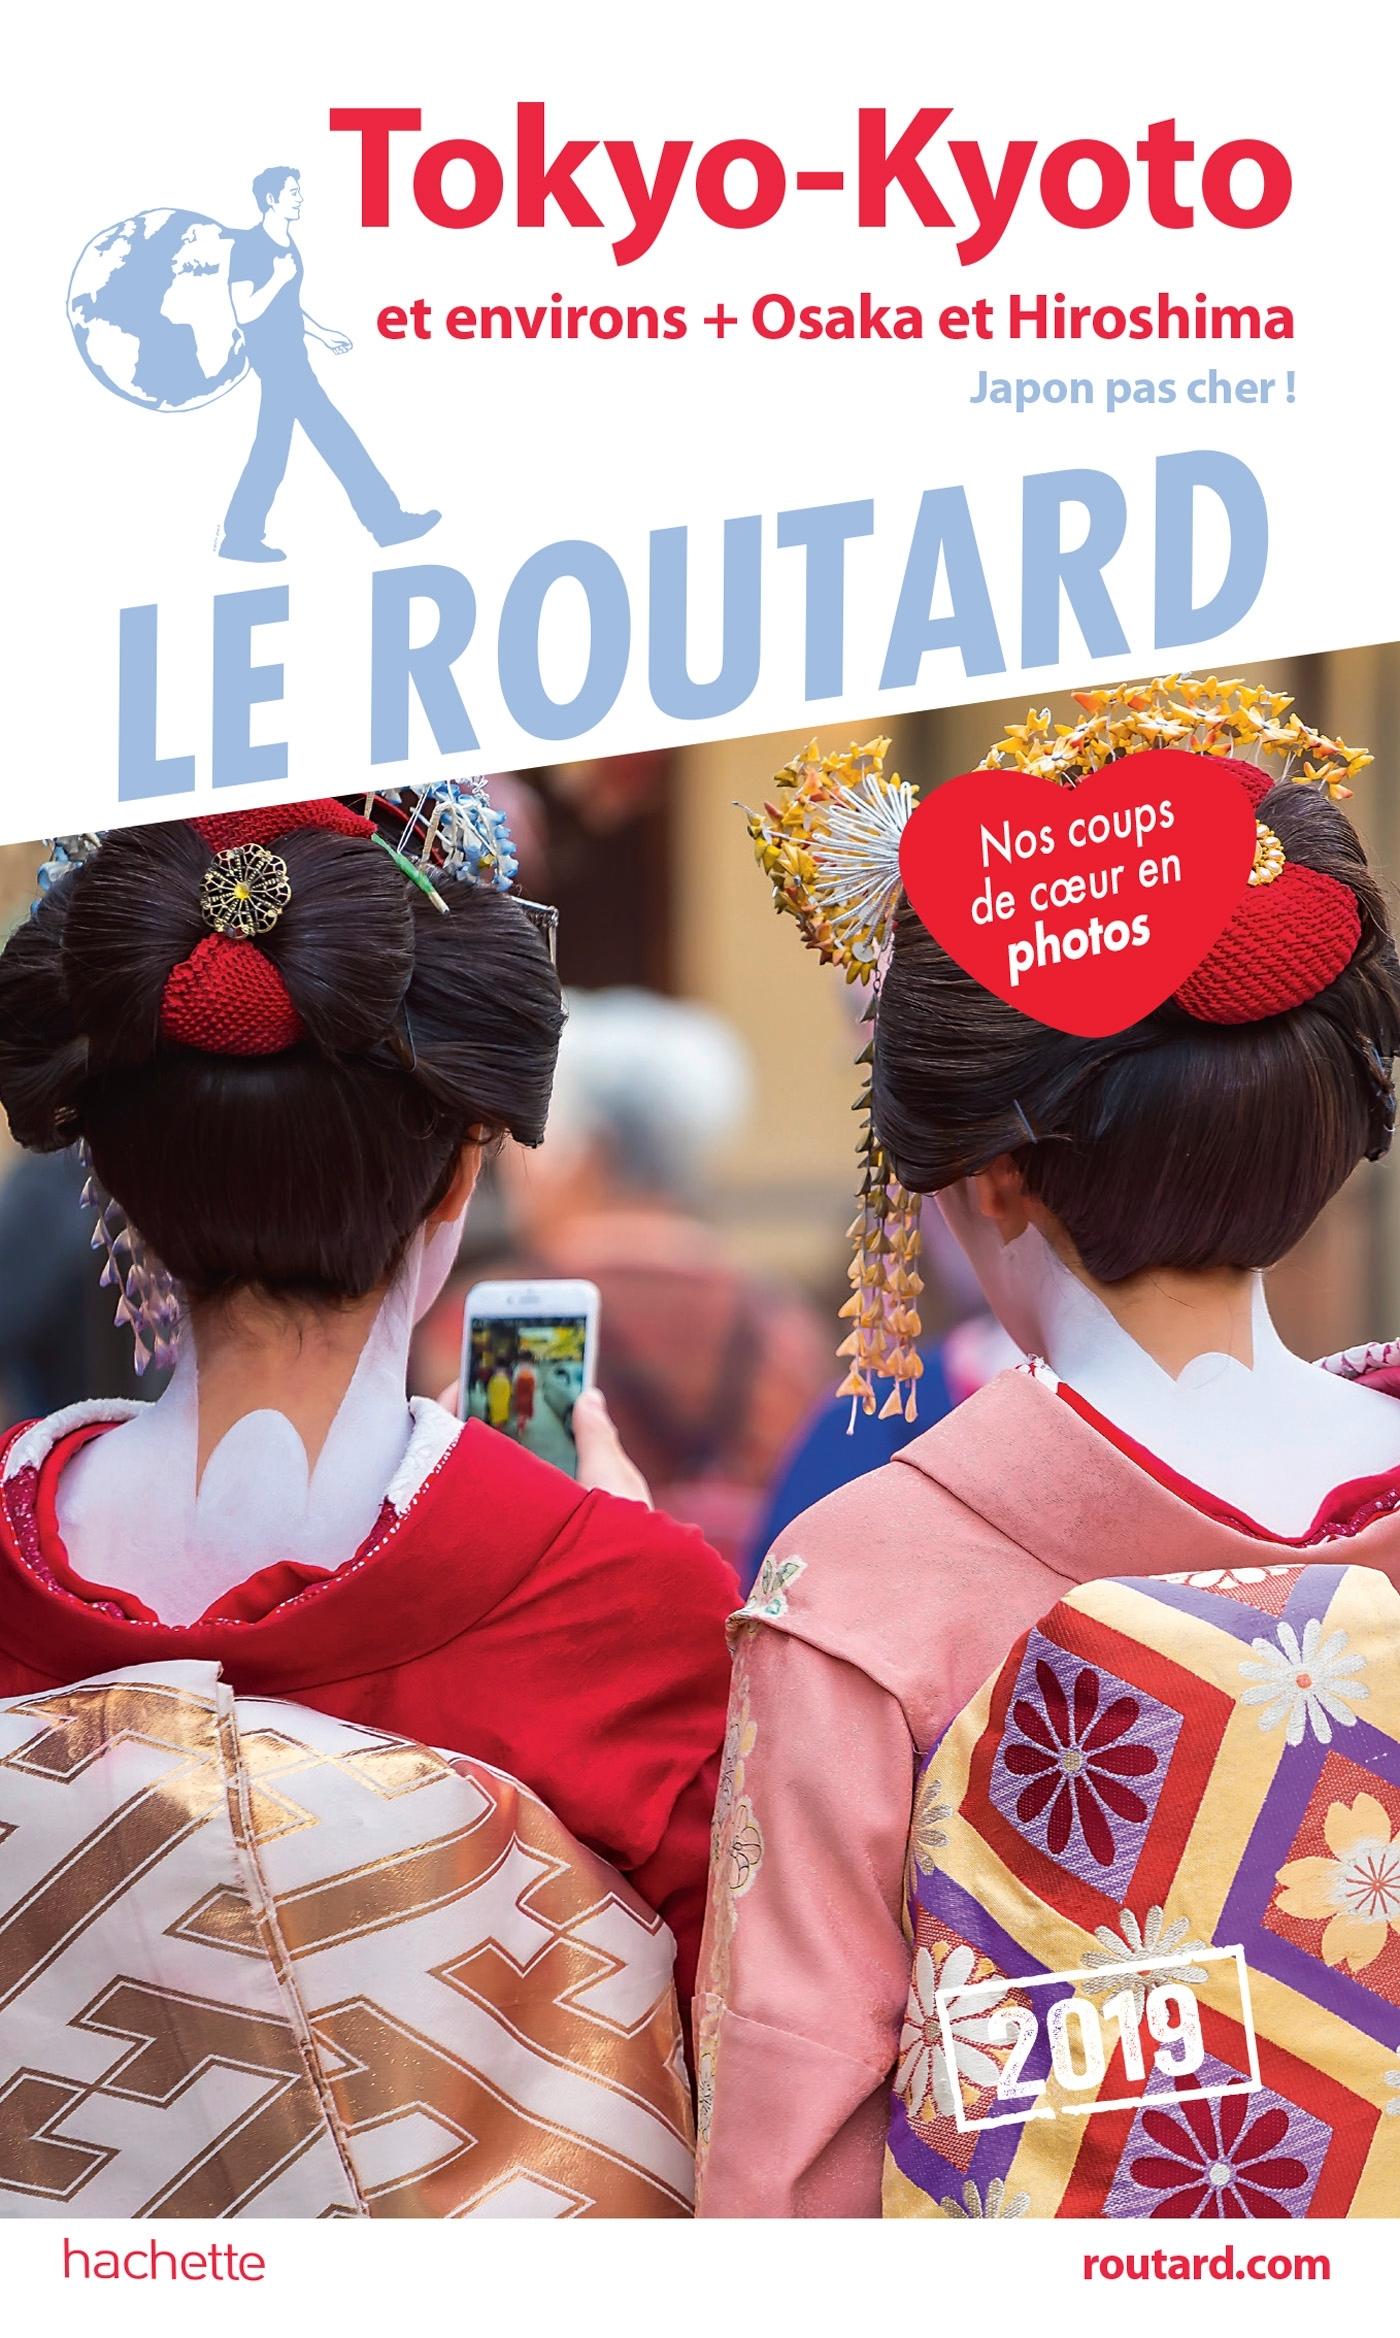 GUIDE DU ROUTARD TOKYO, KYOTO 2019 - +OSAKA, HIROSHIMA, ET LES VILLES IMPERIALES (JAPON PA